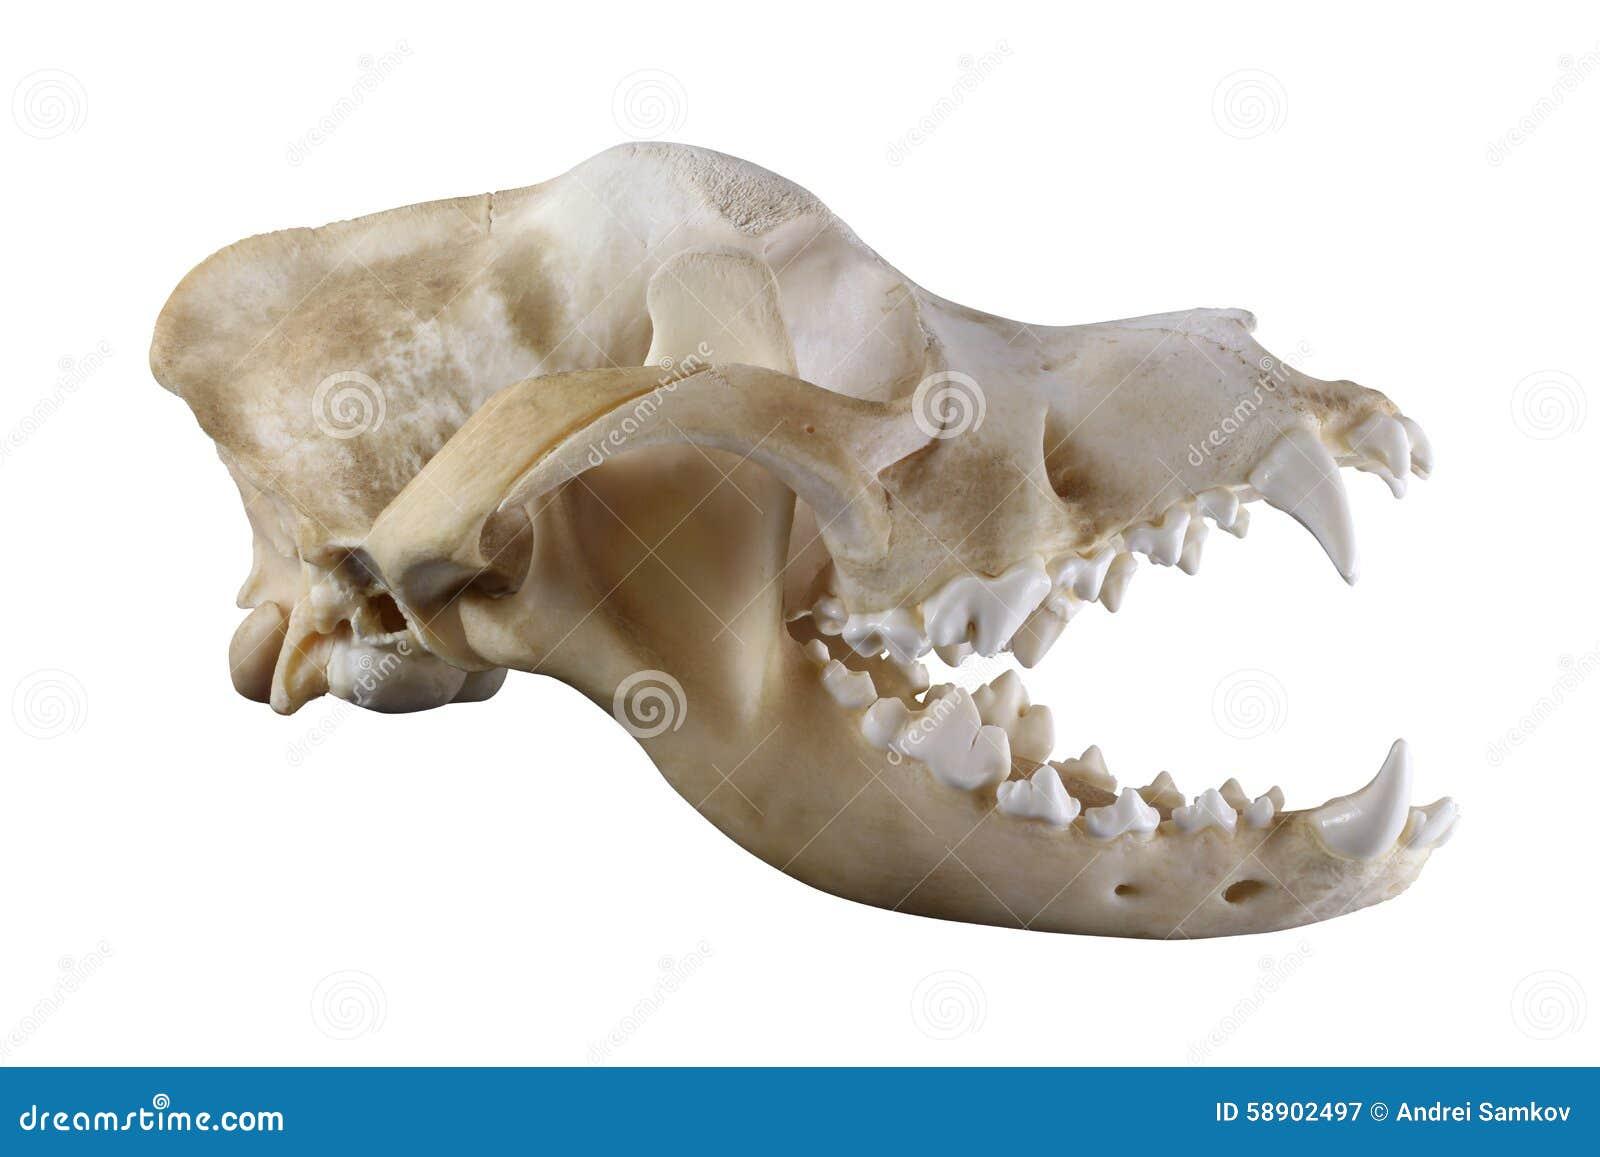 Saint Bernard Dog Skull Isolated On A White Background Stock Image ...